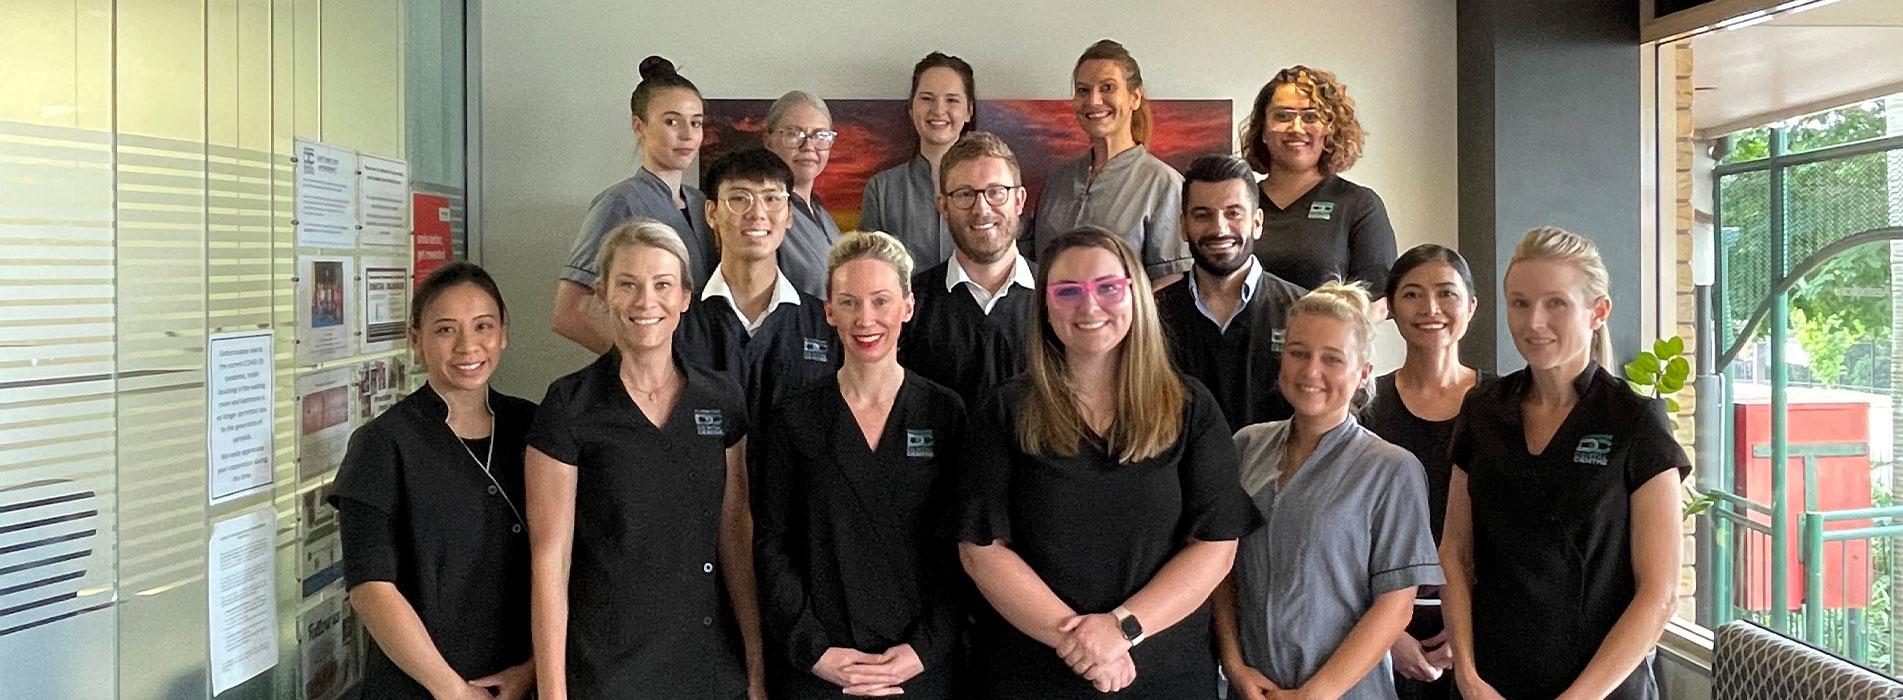 Dental Centre - Kenmore - Our Staff